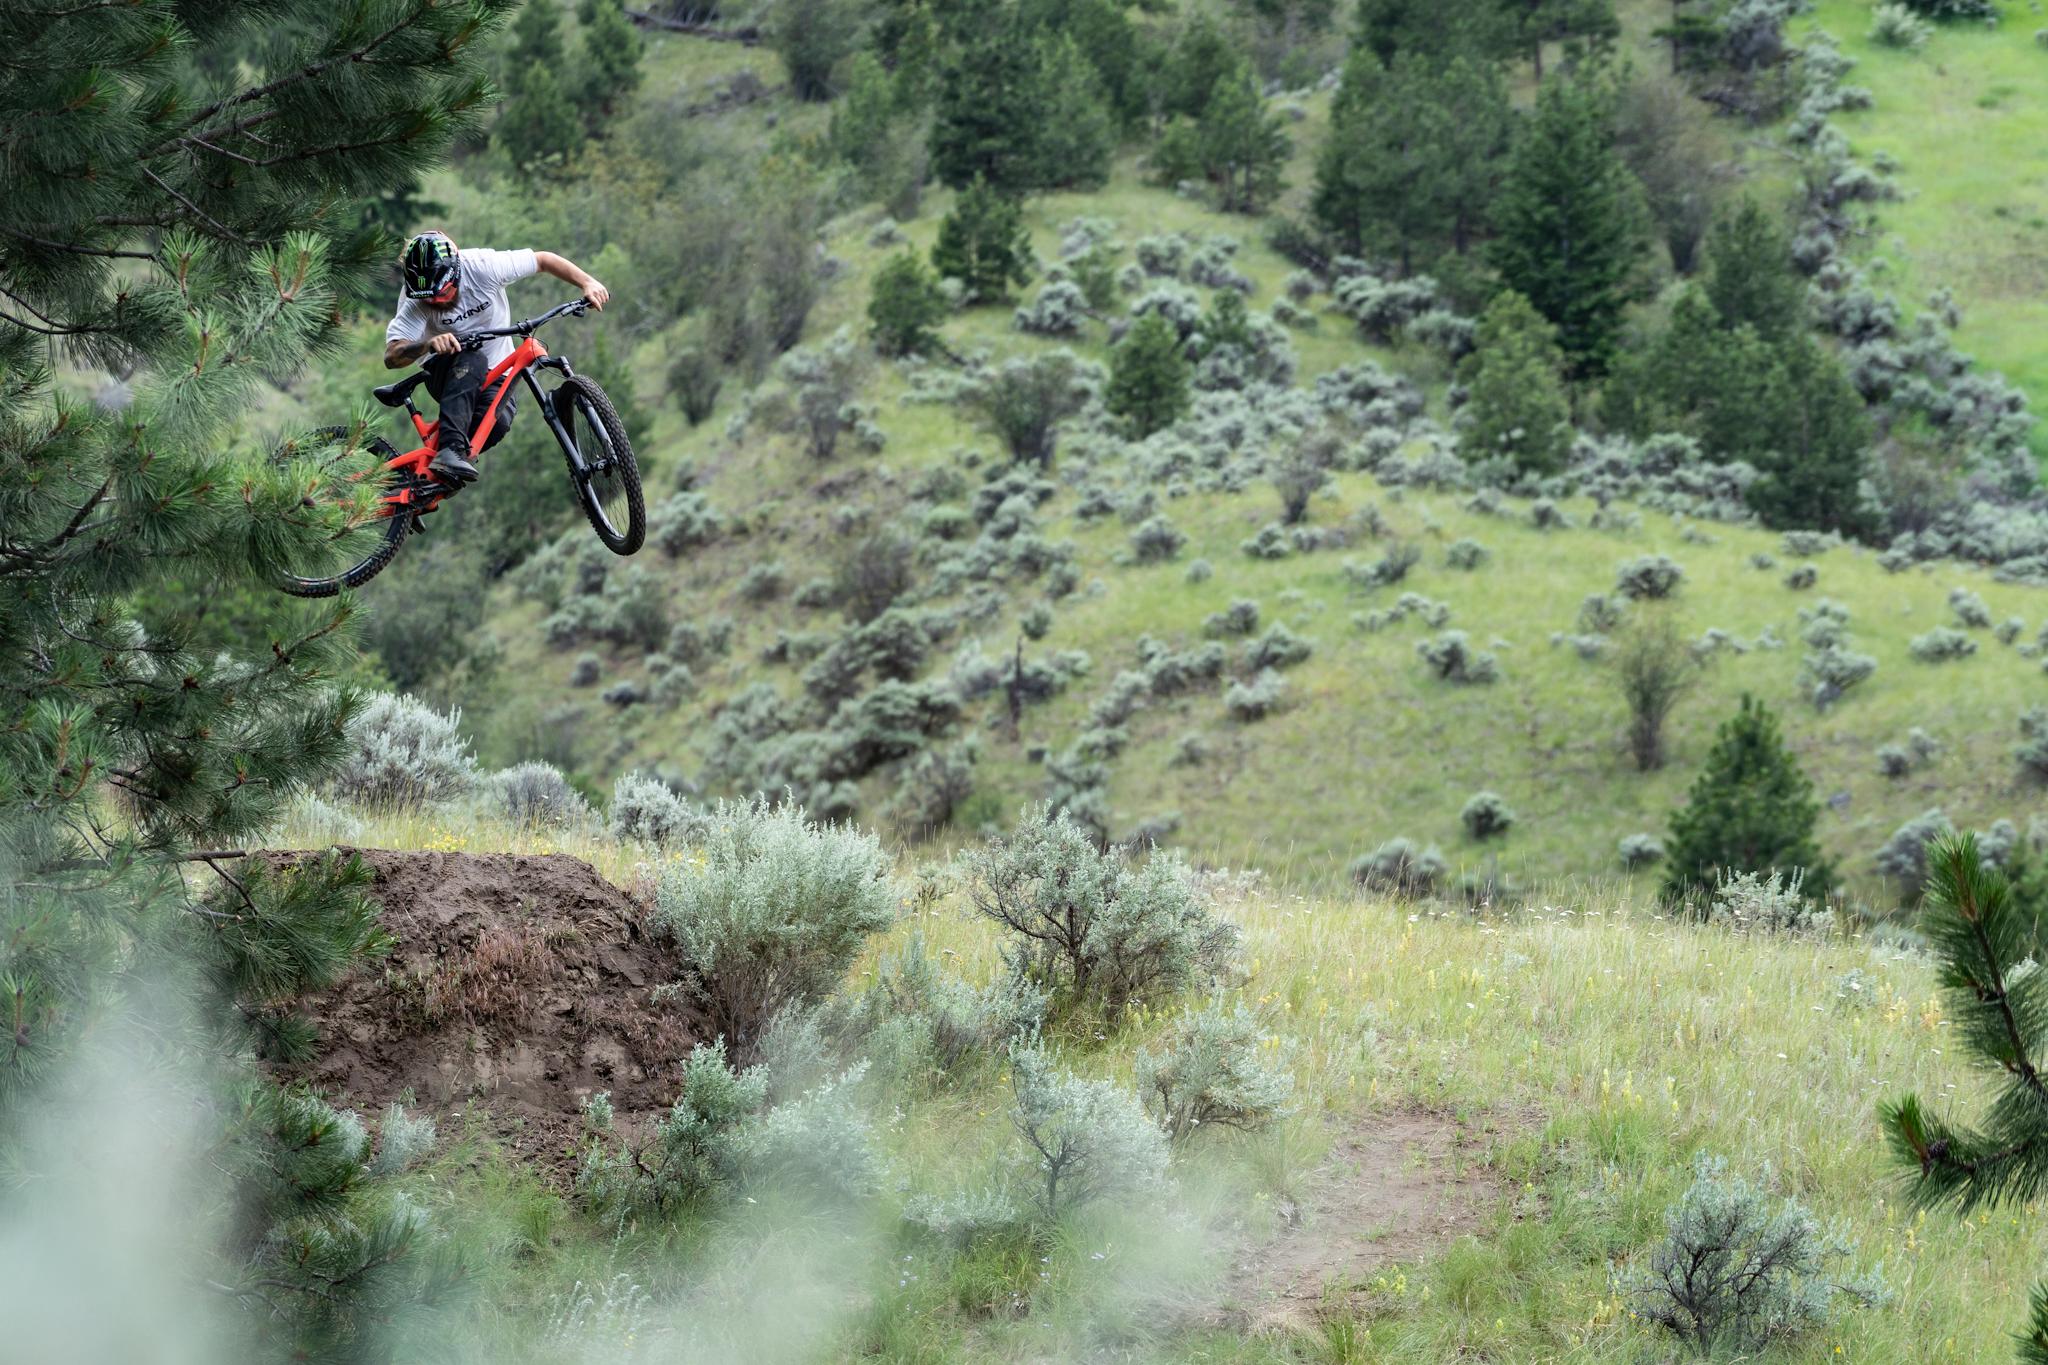 Graham Agassiz putting the new Wreckoning through its paces. Photo by Mason Mashon/Evil Bikes